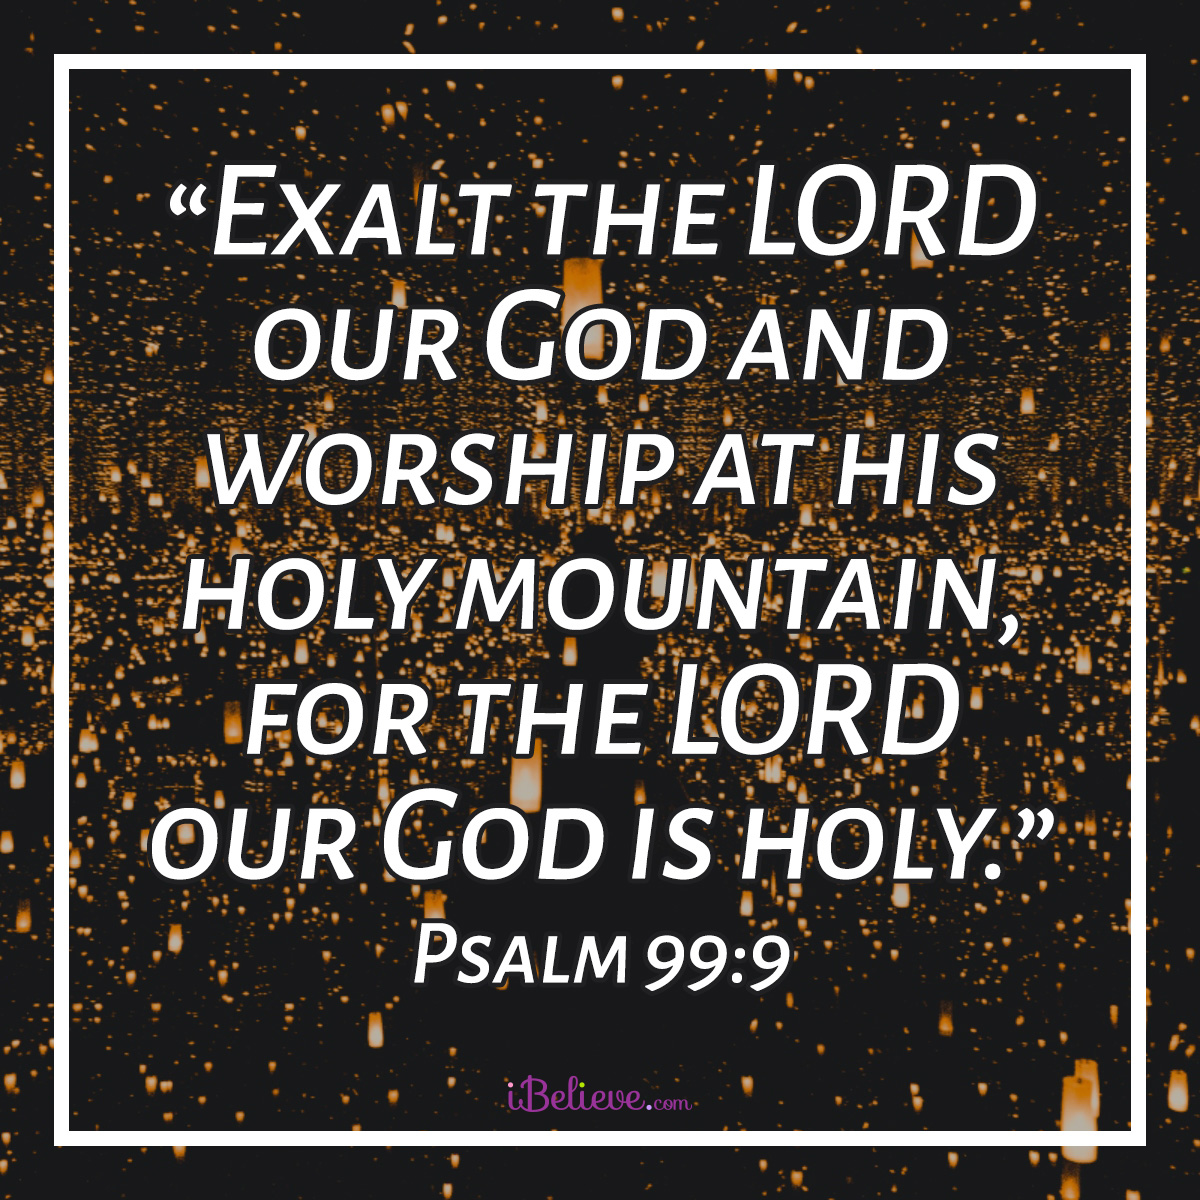 Psalm 99:9 inspirational image